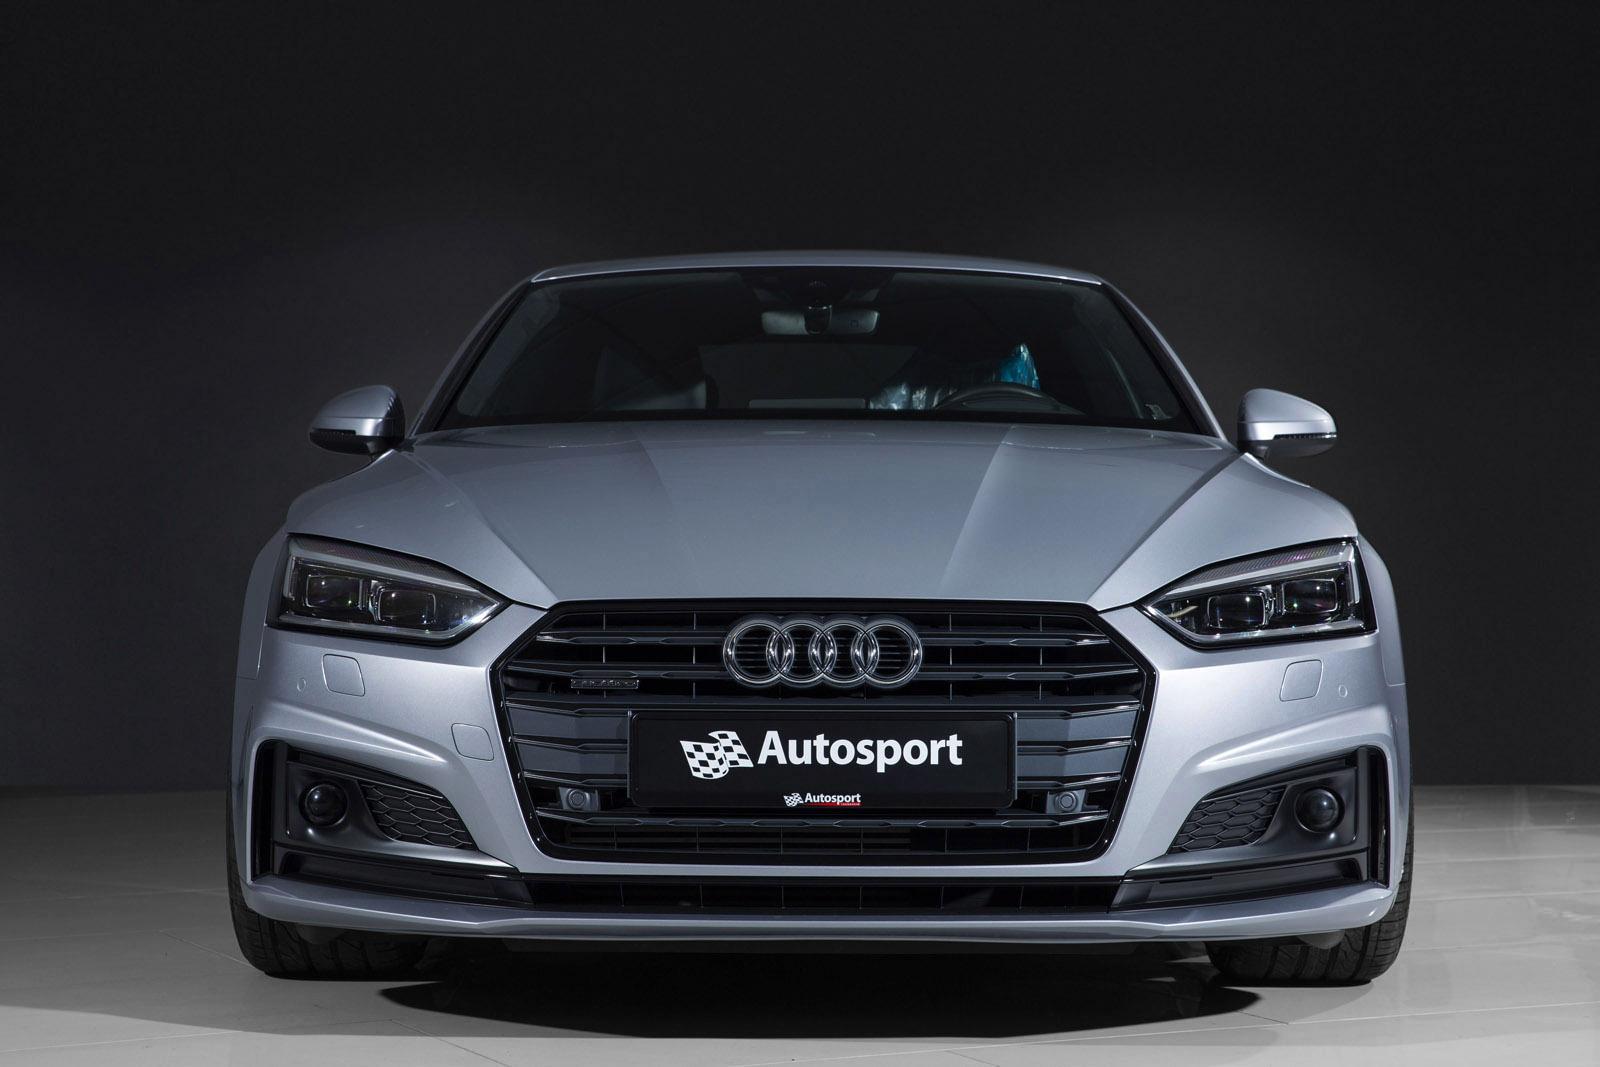 Audi_A5_02-2.jpg